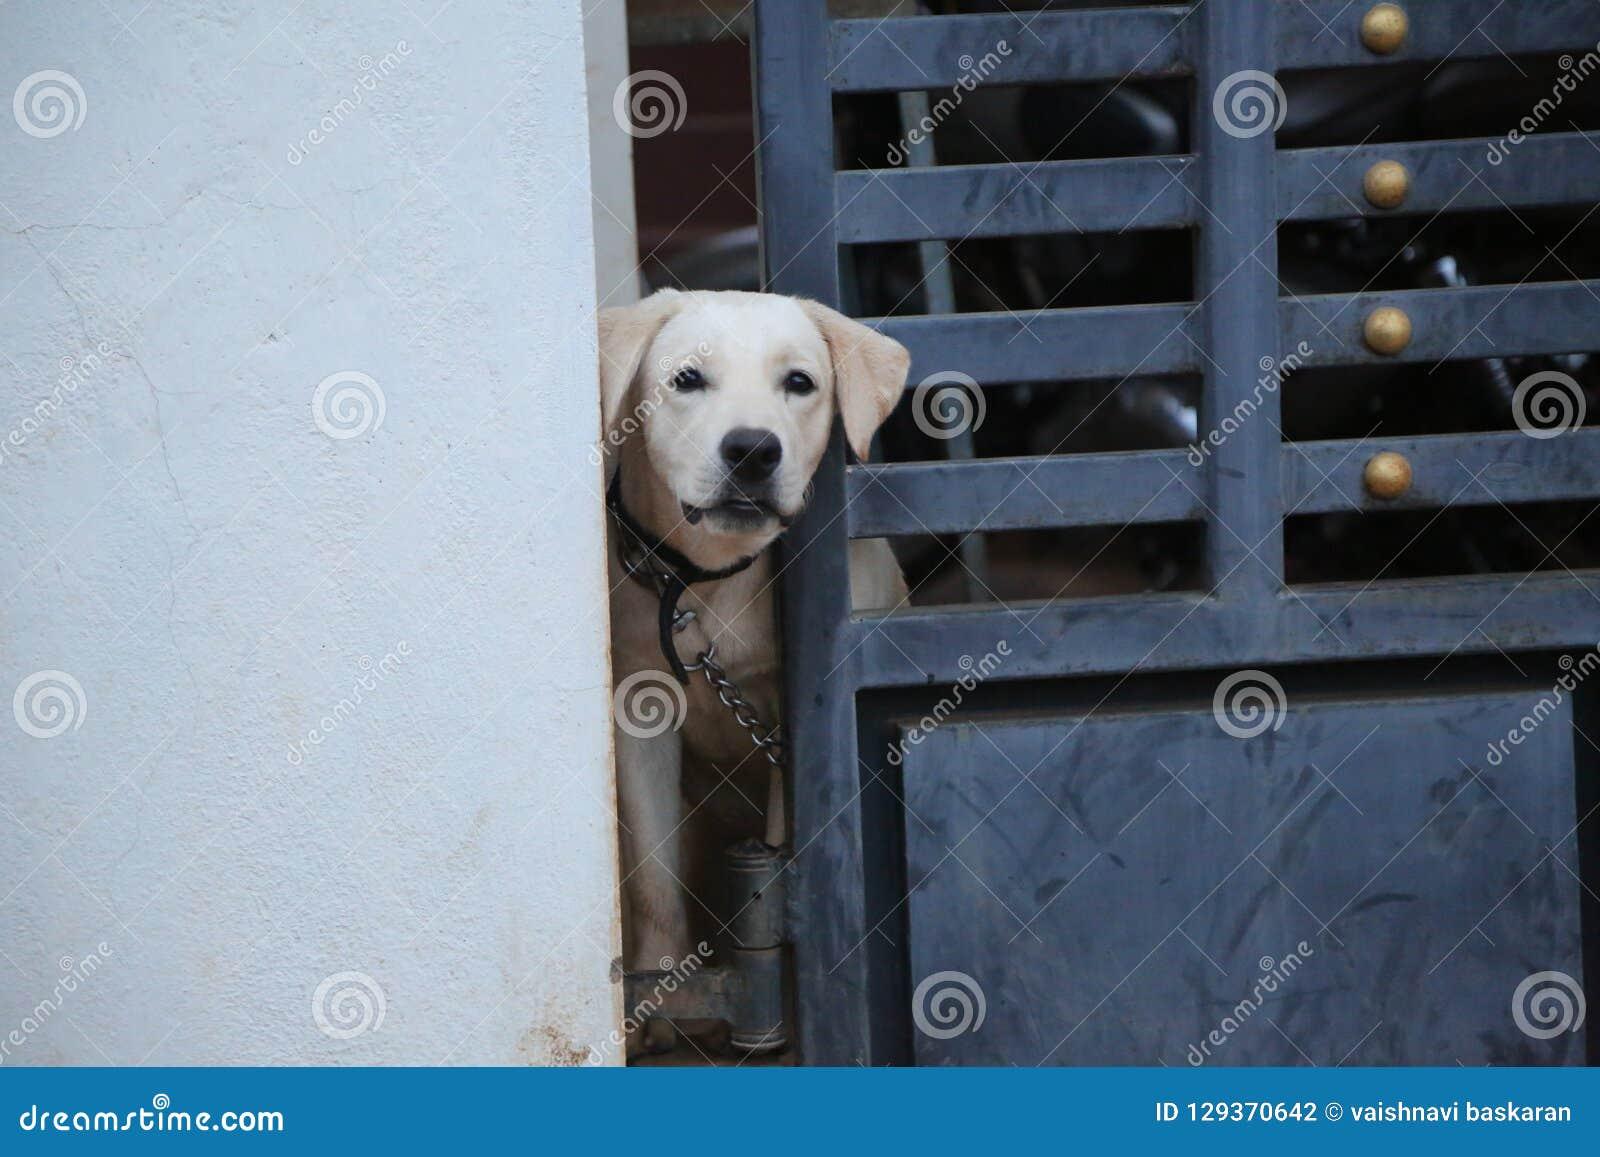 A dog next door